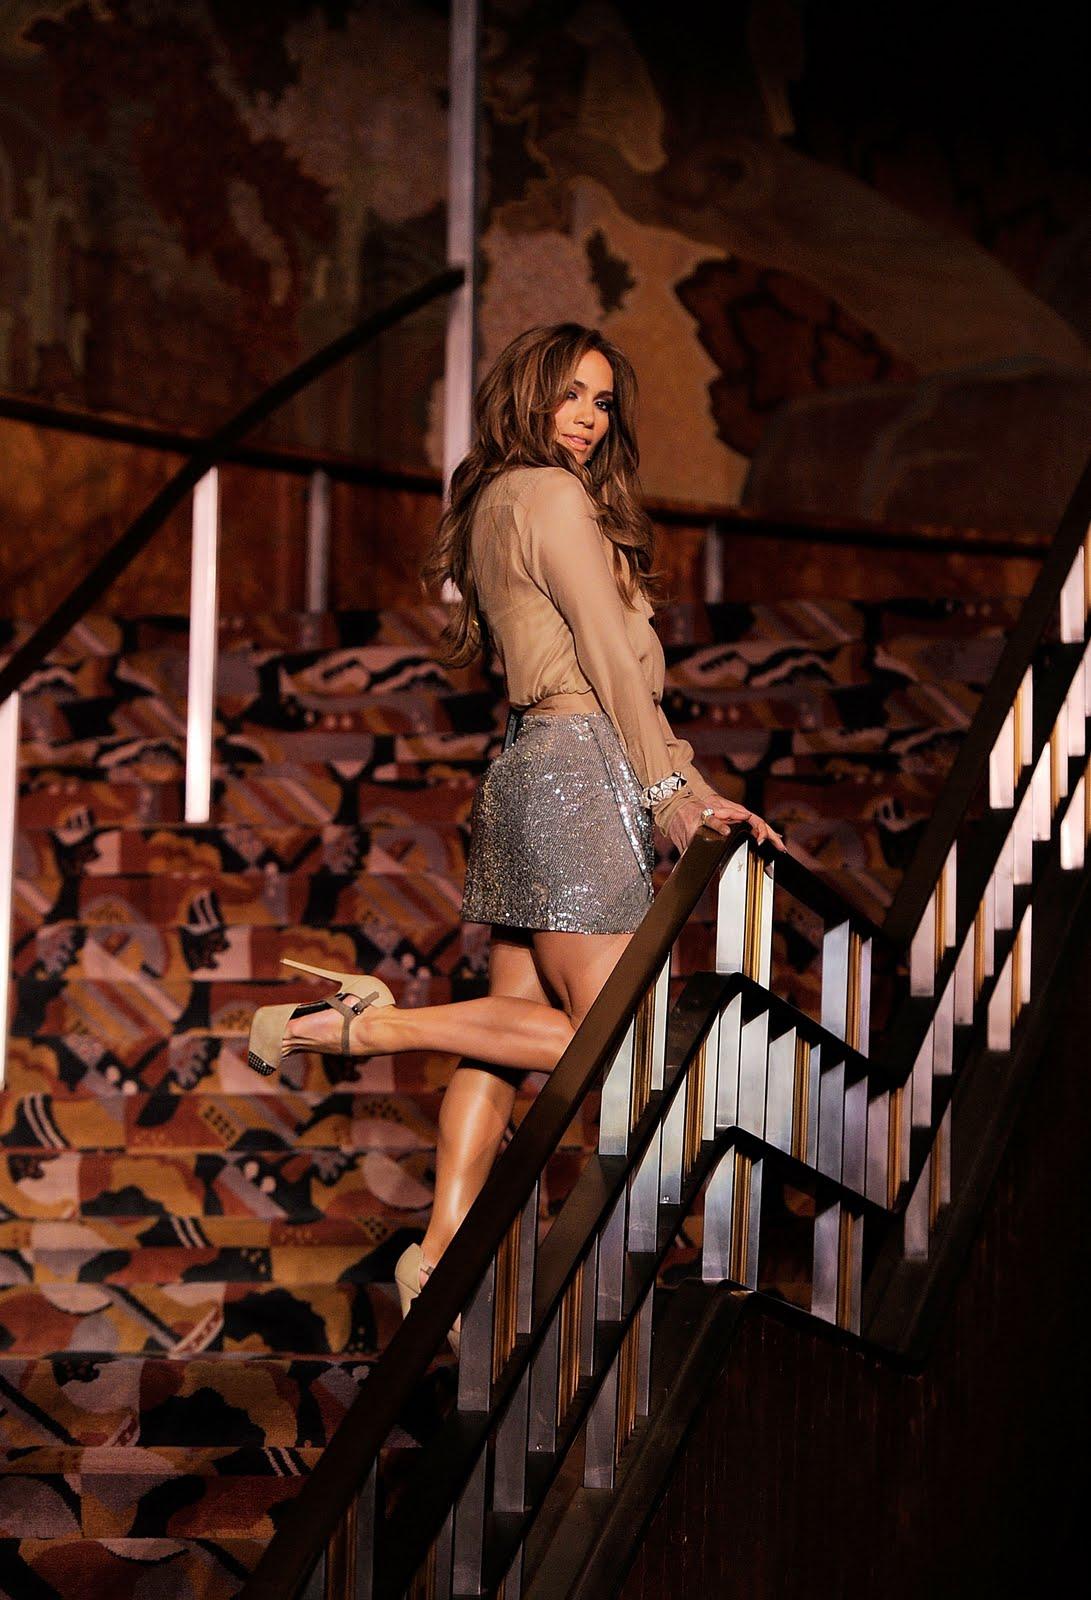 http://2.bp.blogspot.com/-ePTVAjG_aFI/Te_cxcYzccI/AAAAAAAAH80/wM6L67rTwg0/s1600/Jennifer_Lopez_Gillette_Venus_Global_Ambassador_053_122_457lo.jpg